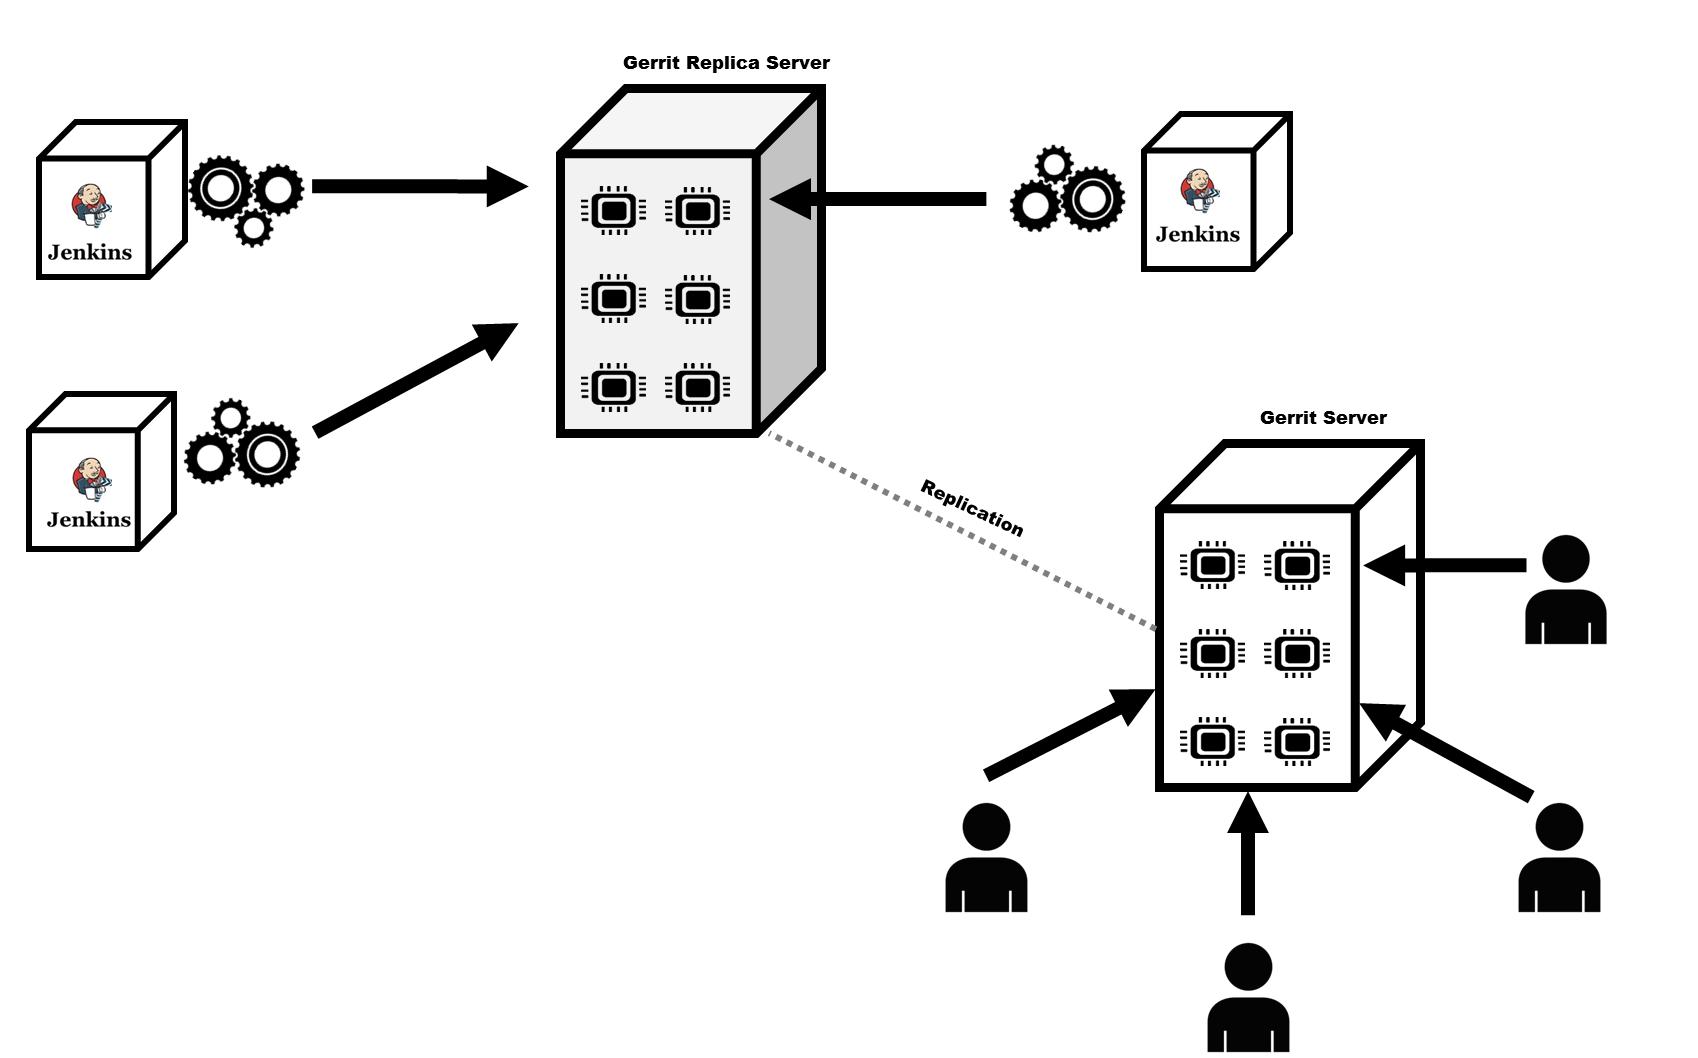 Configure Git plugin & Gerrit trigger to make use of replica